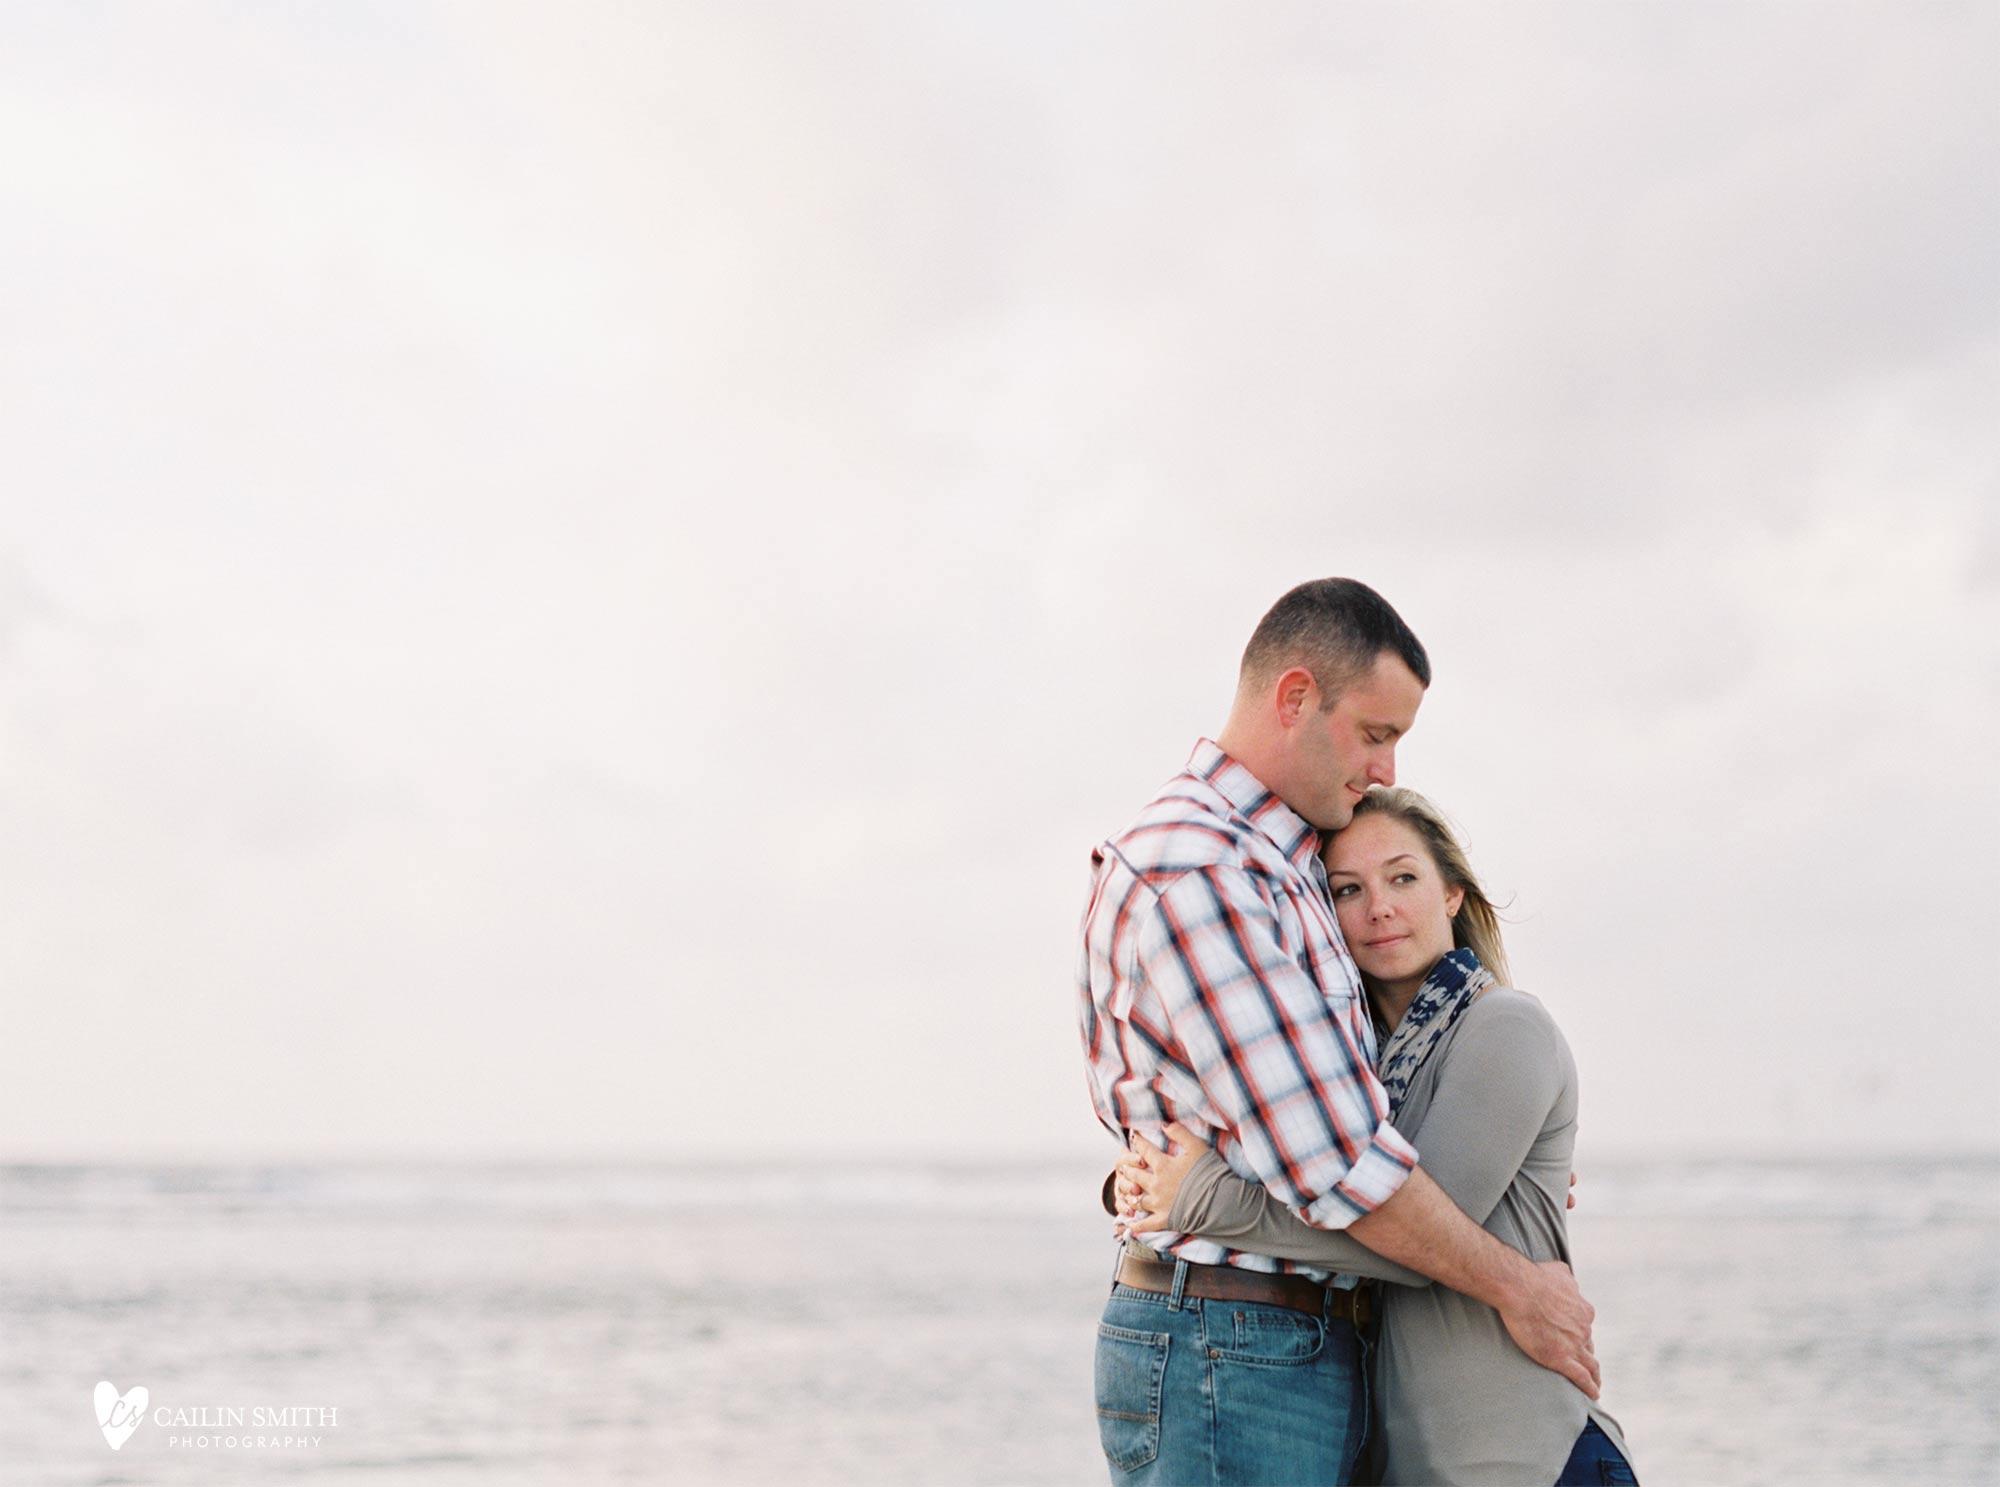 Sarah_Justin_Saint_Simons_Island_Engagement_Photography_003.jpg